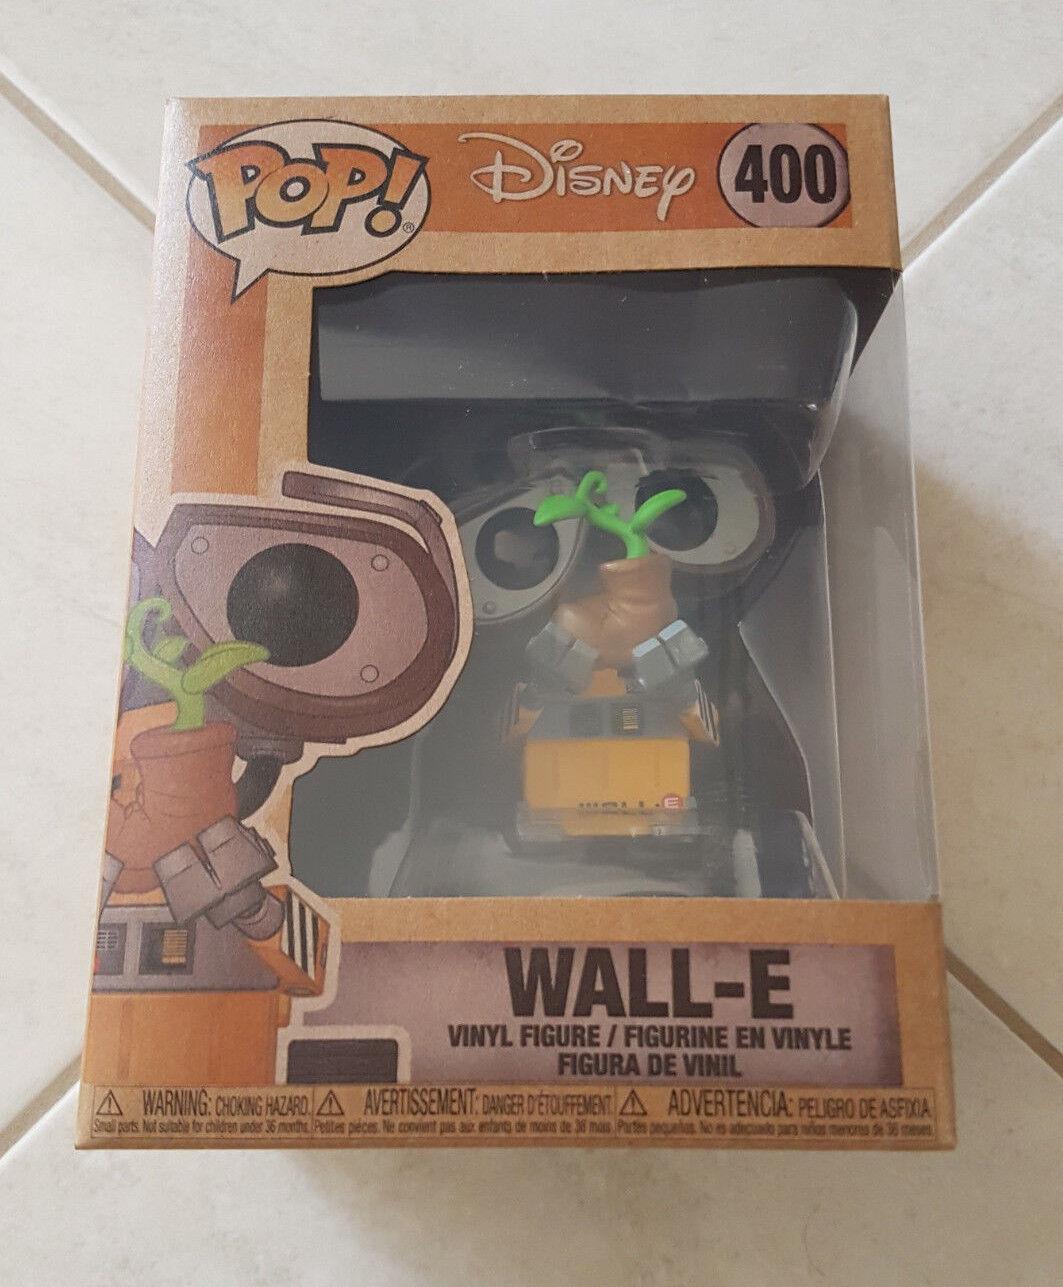 Wall-E Earth Day EXCLUSIVE Funko Pop Vinyl Figure RARE (READY TO POST)